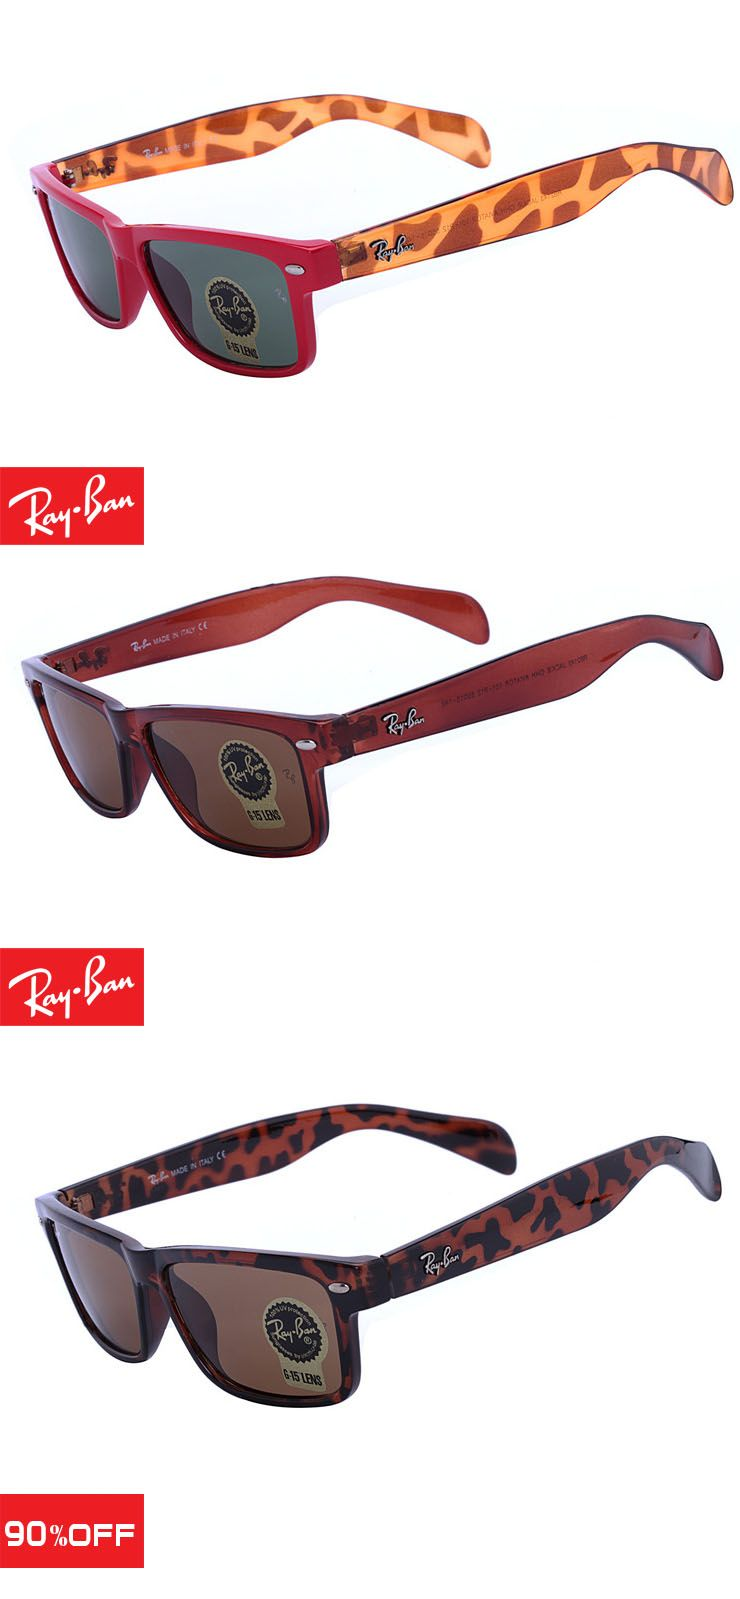 0e306eb07d5 cheap but nice Ray-Ban sunglasses Fashion And Cheap Ray Ban Sunglasses  Brown Frame Is